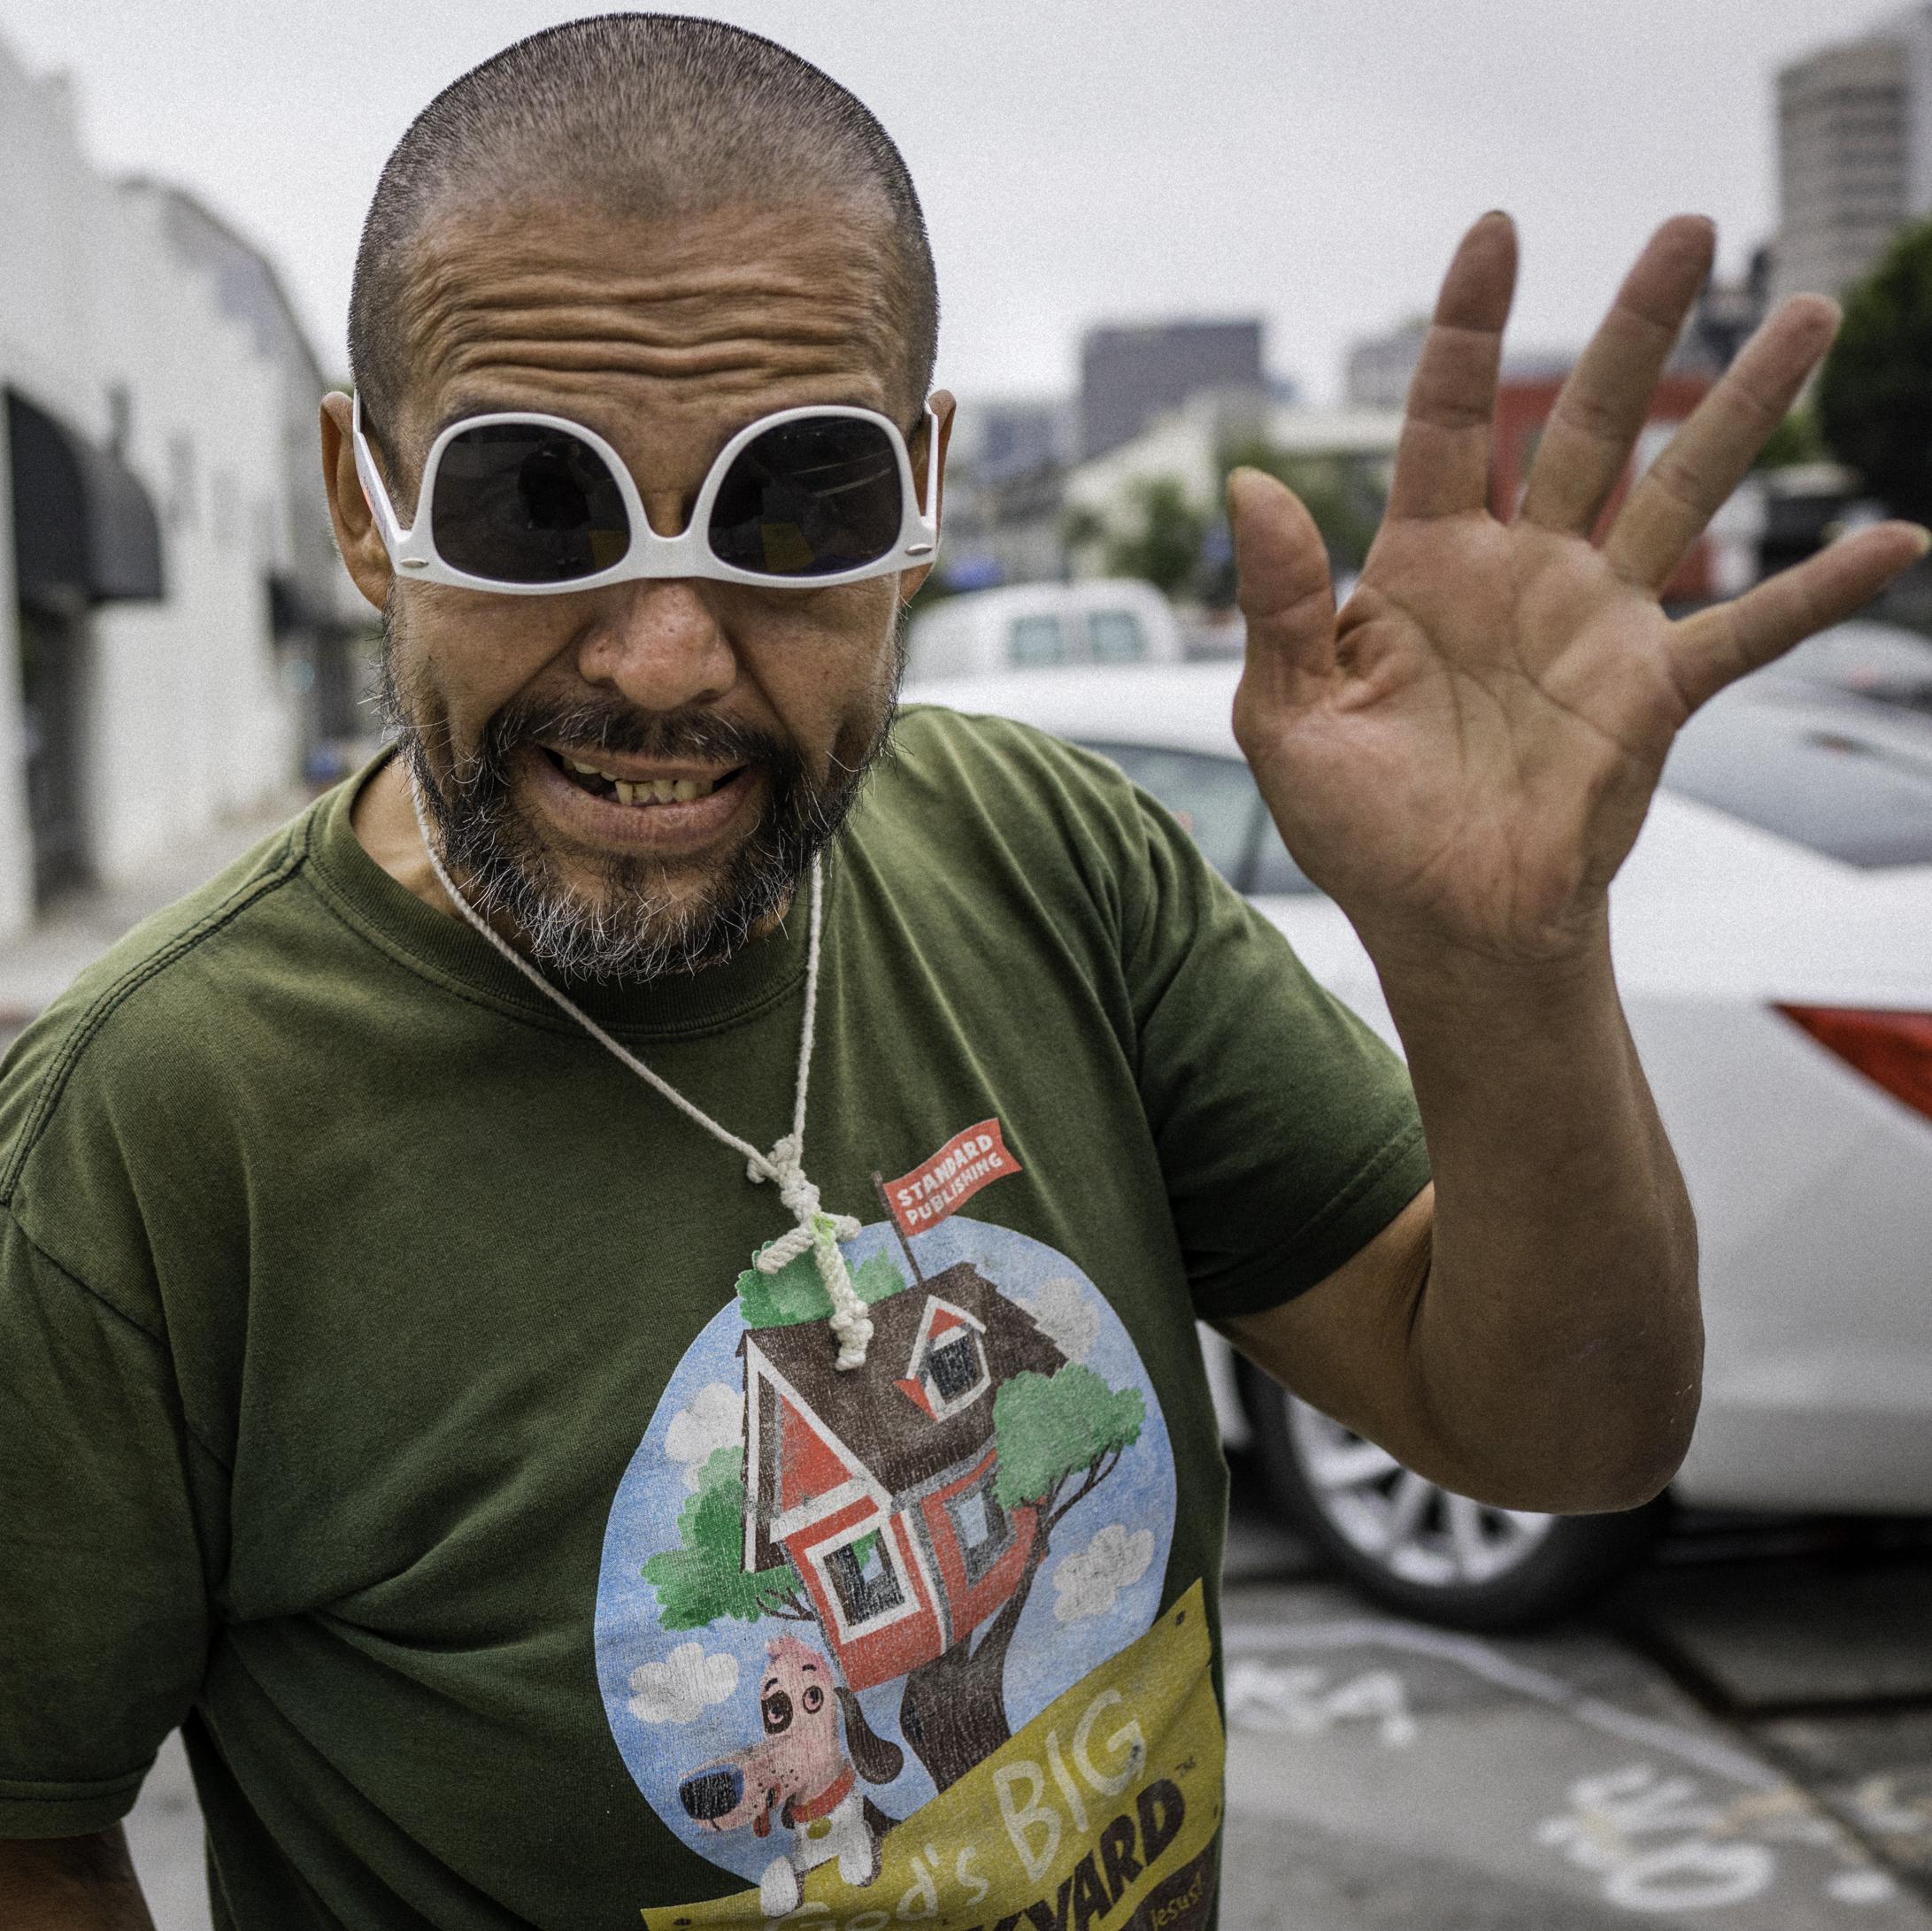 Homeless with Glasses upside down Asian.jpg